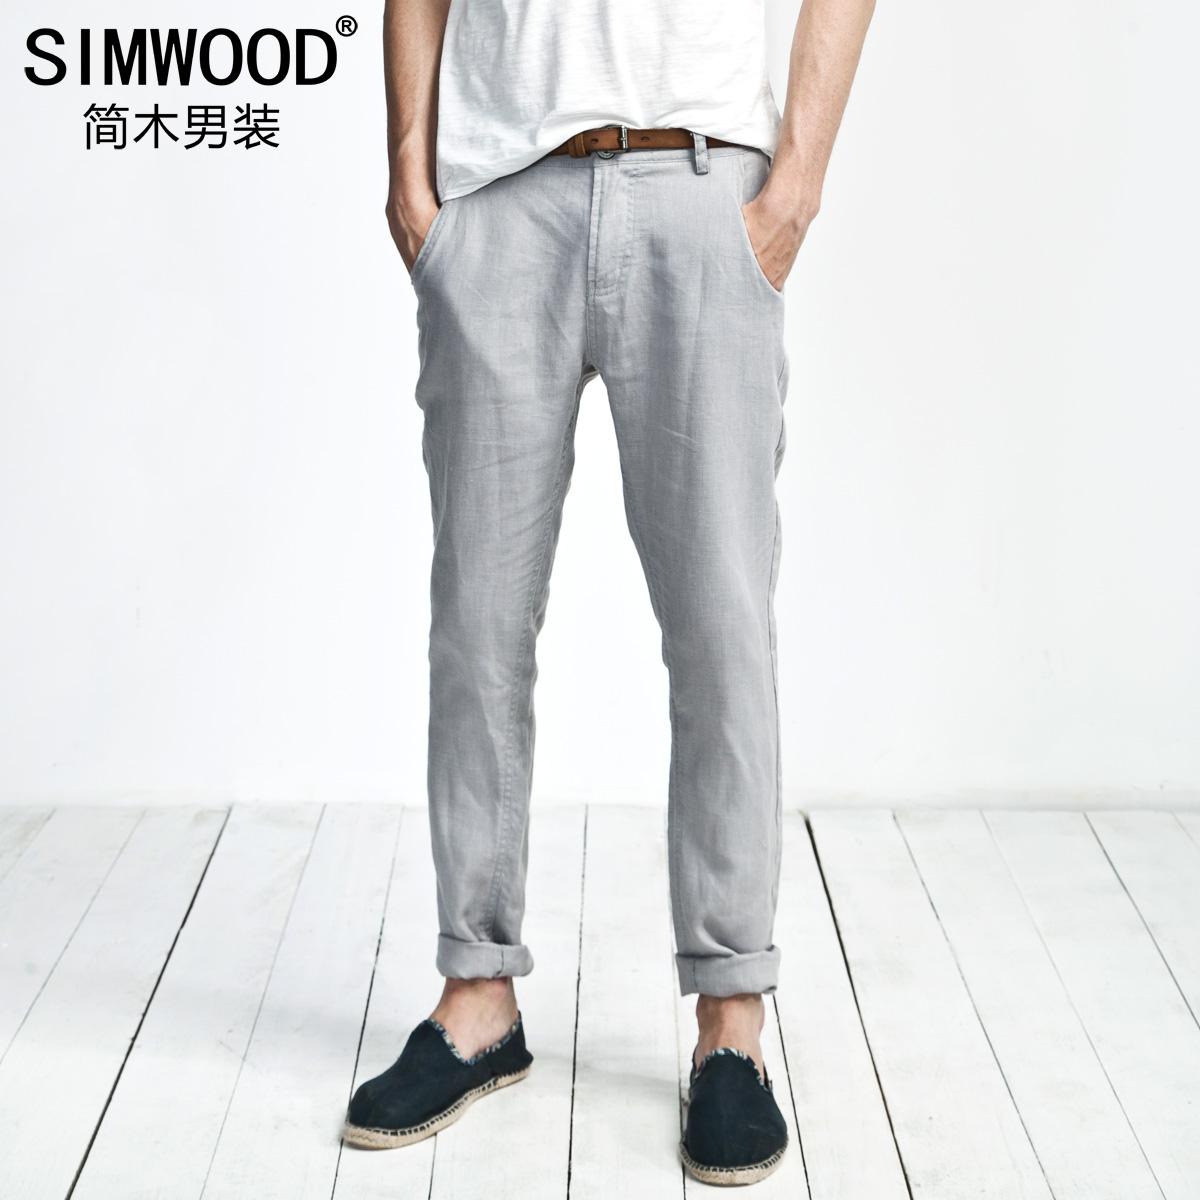 Where can i buy skinny dress pants